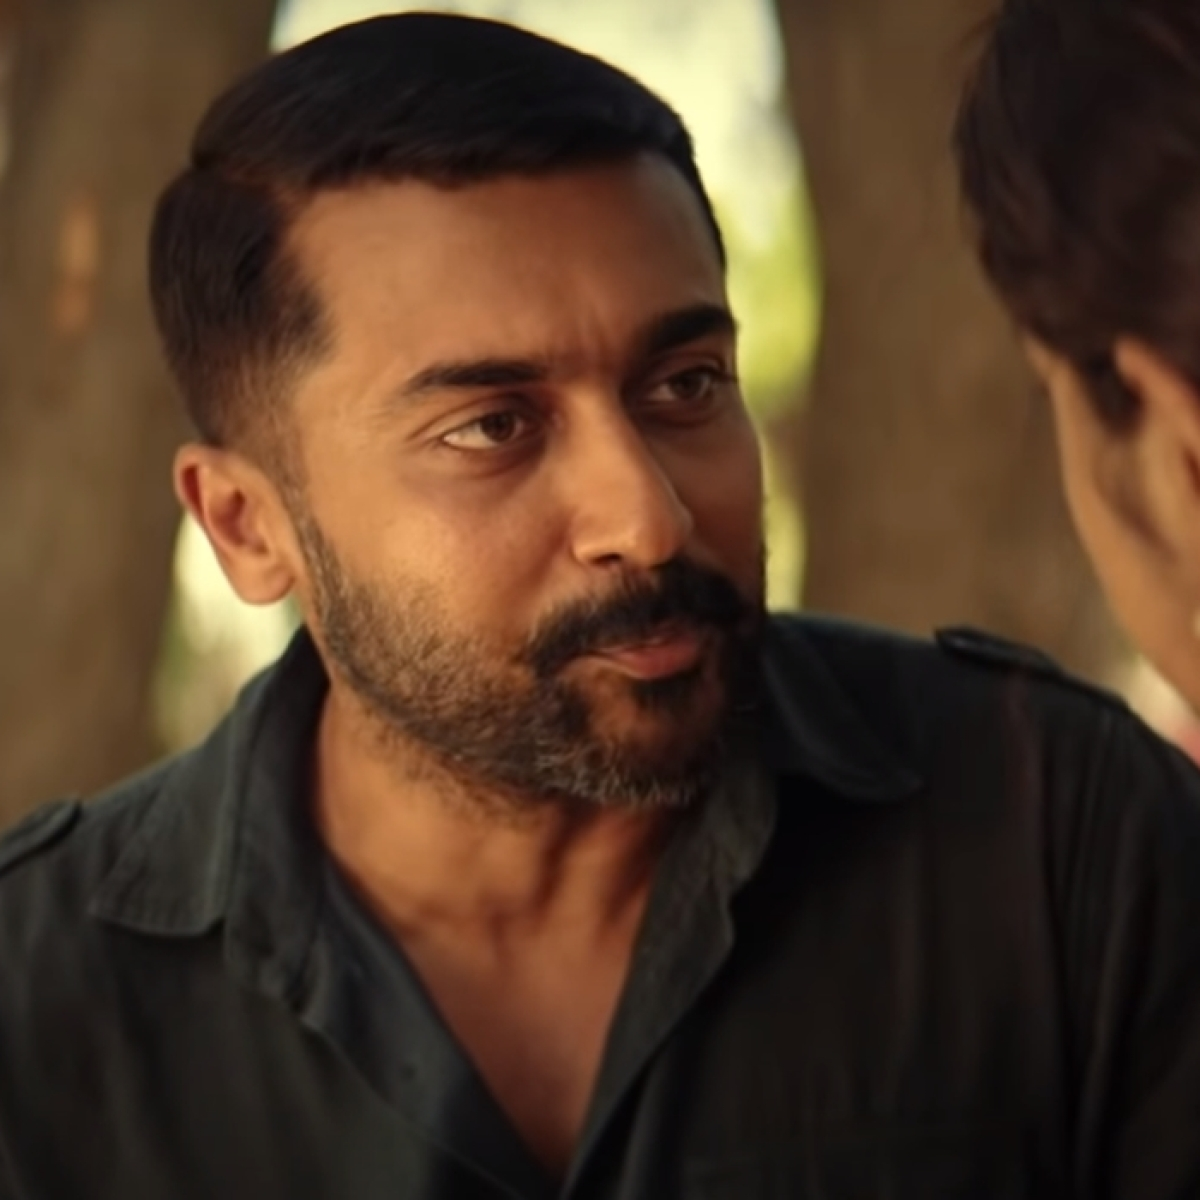 Oscars 2021: Suriya's 'Soorarai Pottru' only Indian film eligible for Best Picture nomination